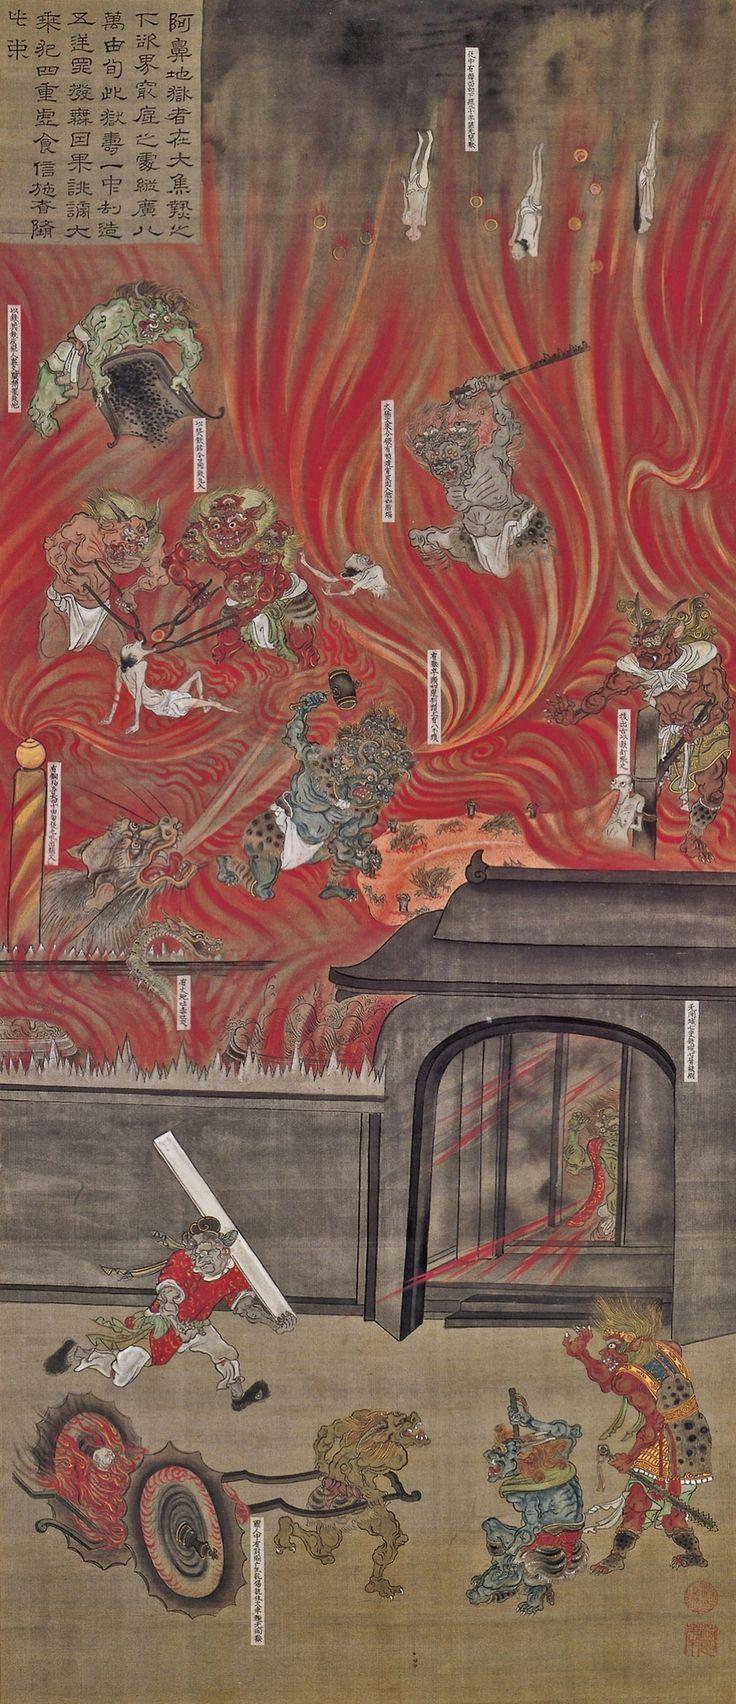 Animusinviolabilis: Avici, The Lowest Level Of Buddhist Hell六道 ɘ�鼻地獄幅